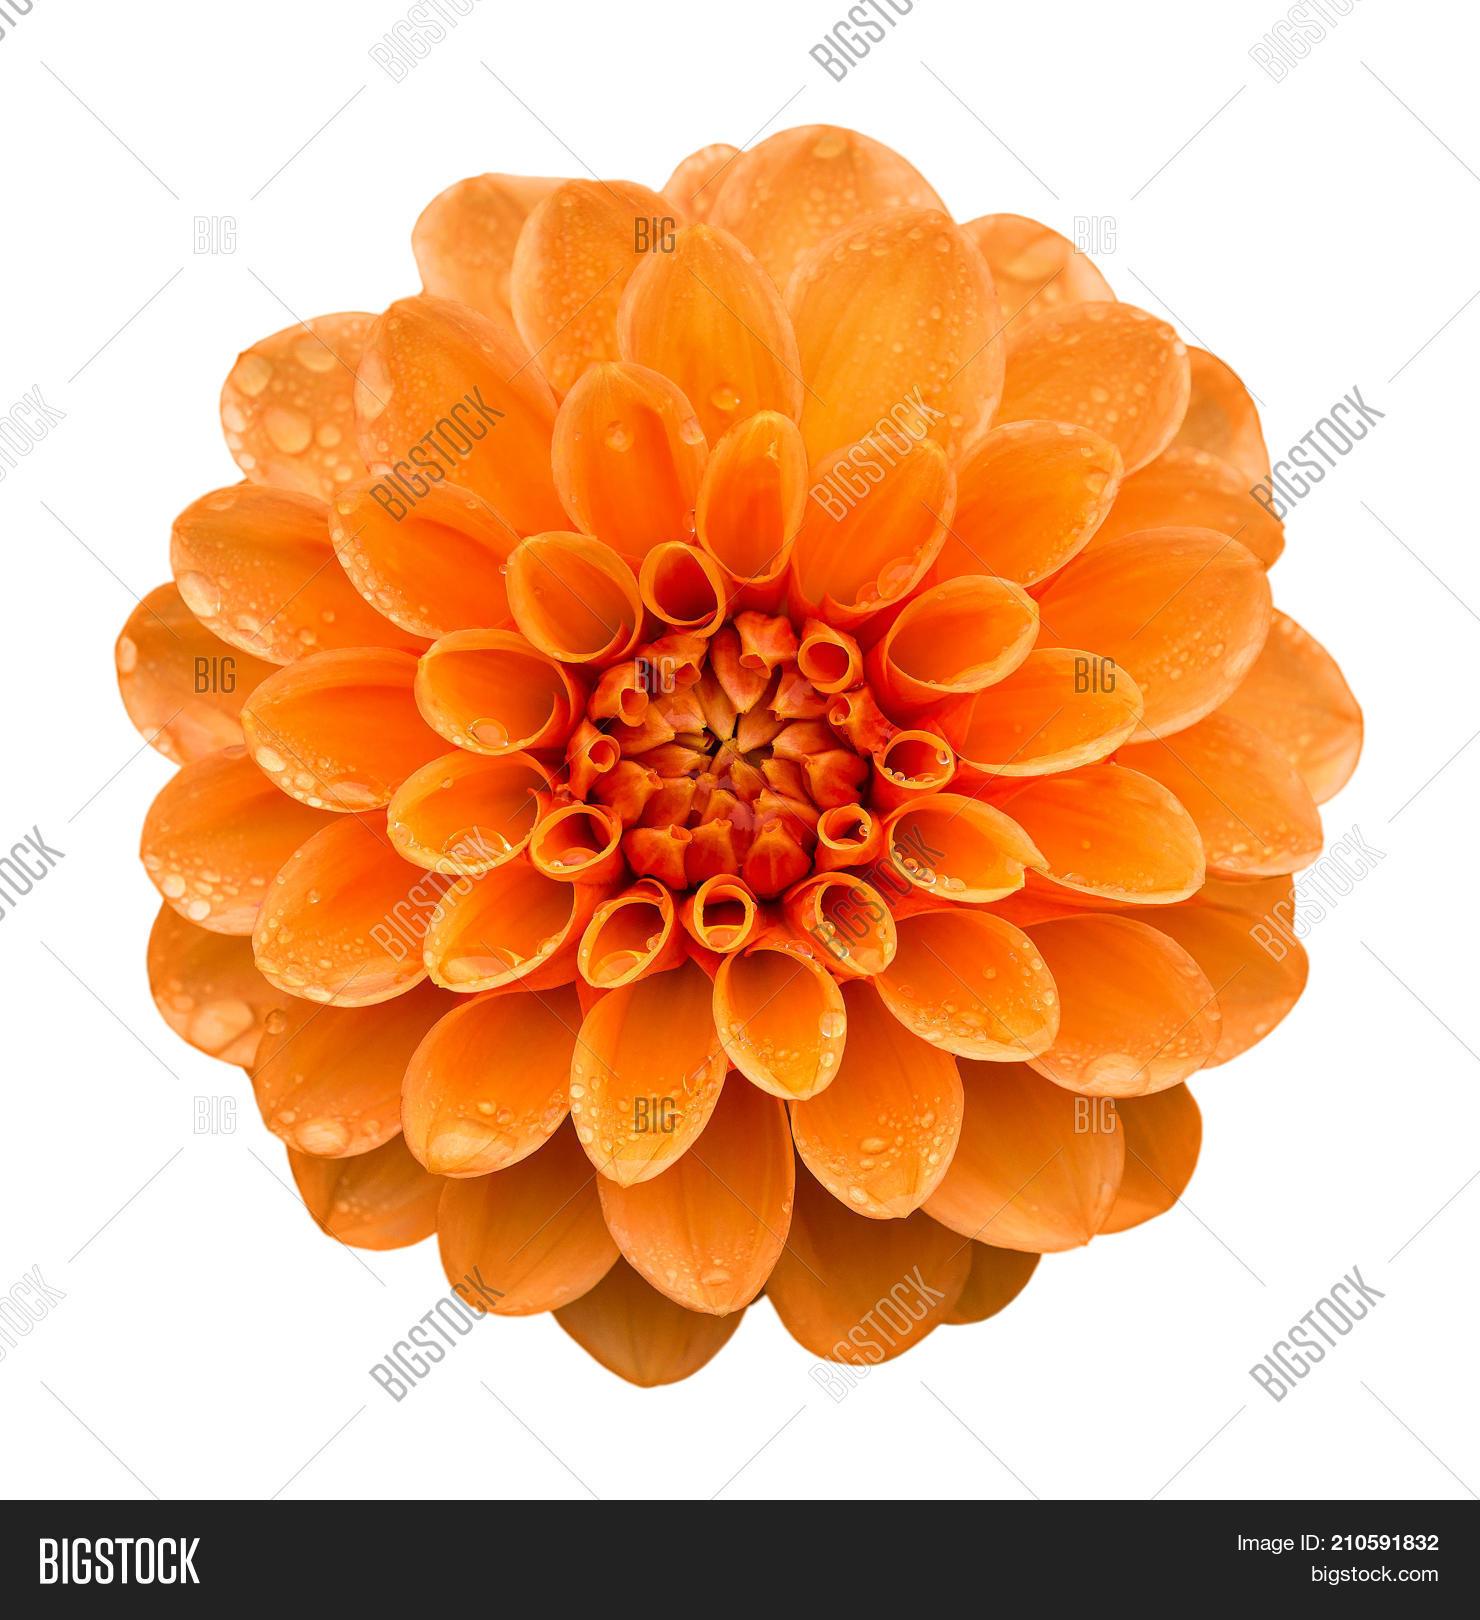 Orange Yellow Dahlia Image Photo Free Trial Bigstock